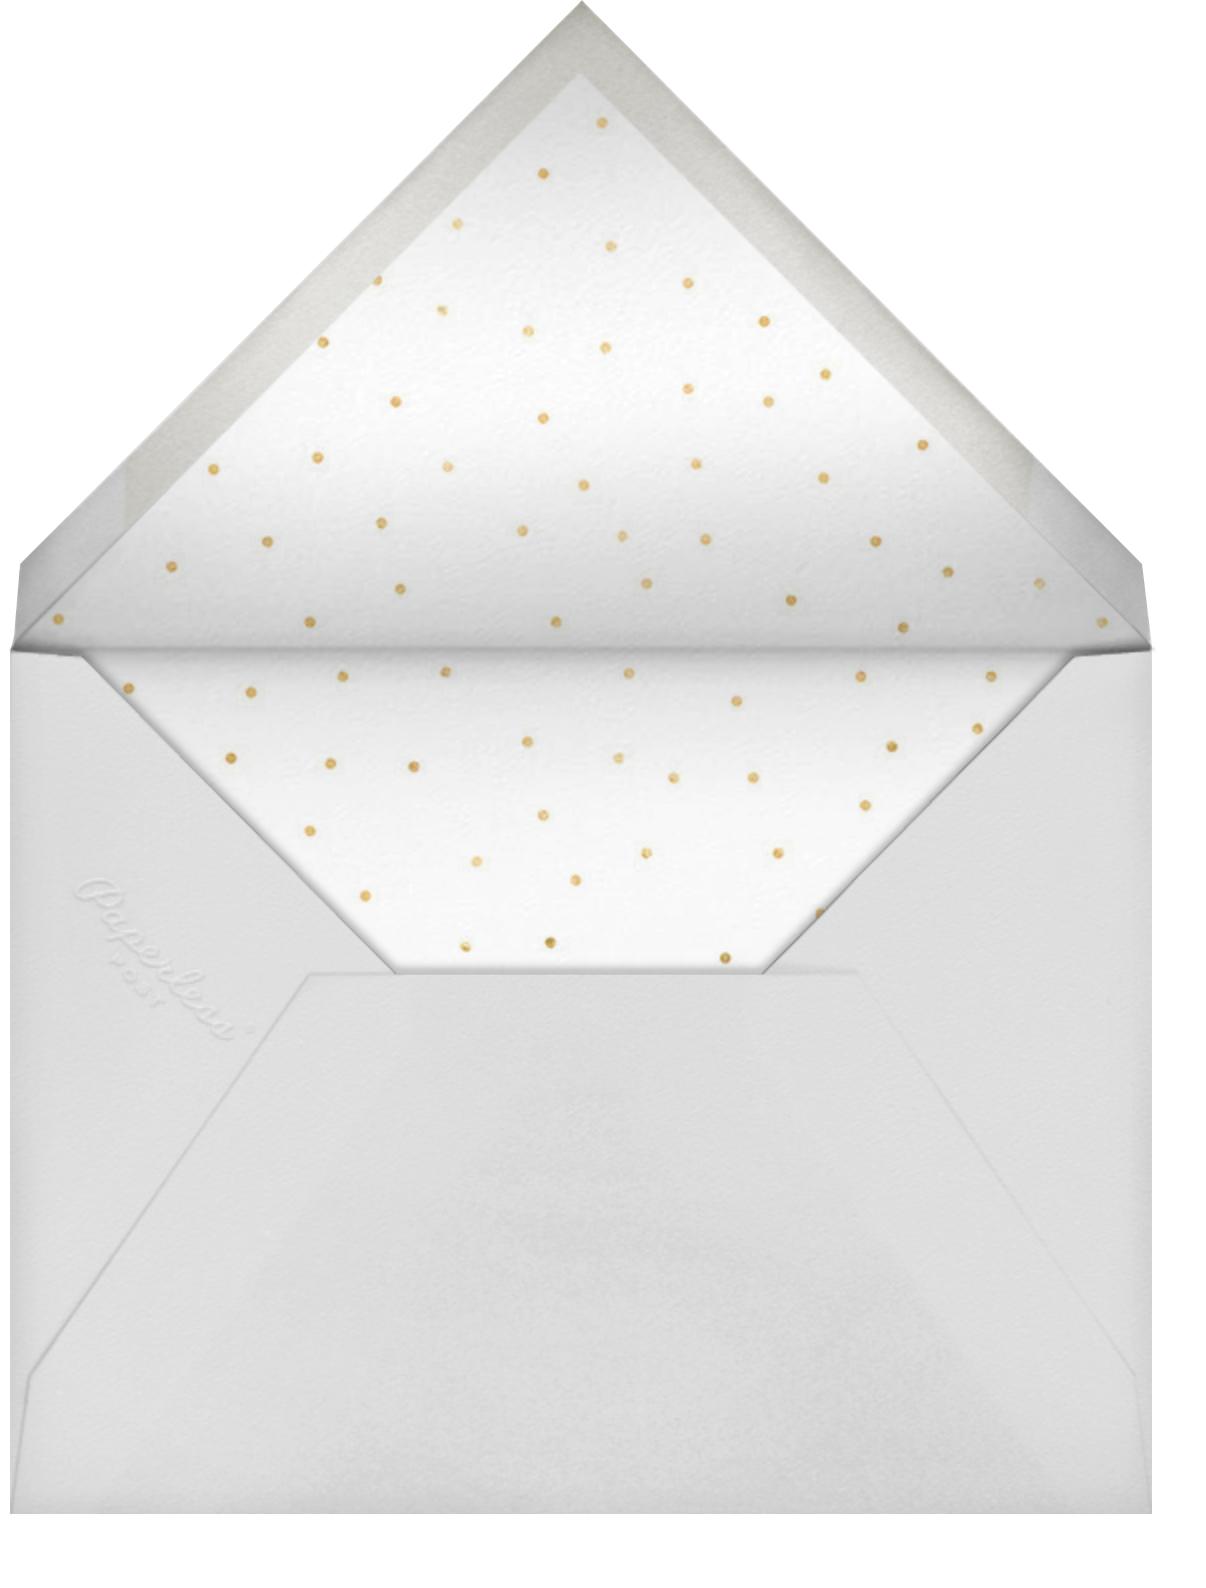 Jubilant Jumble - New Years - Paperless Post - New Year - envelope back